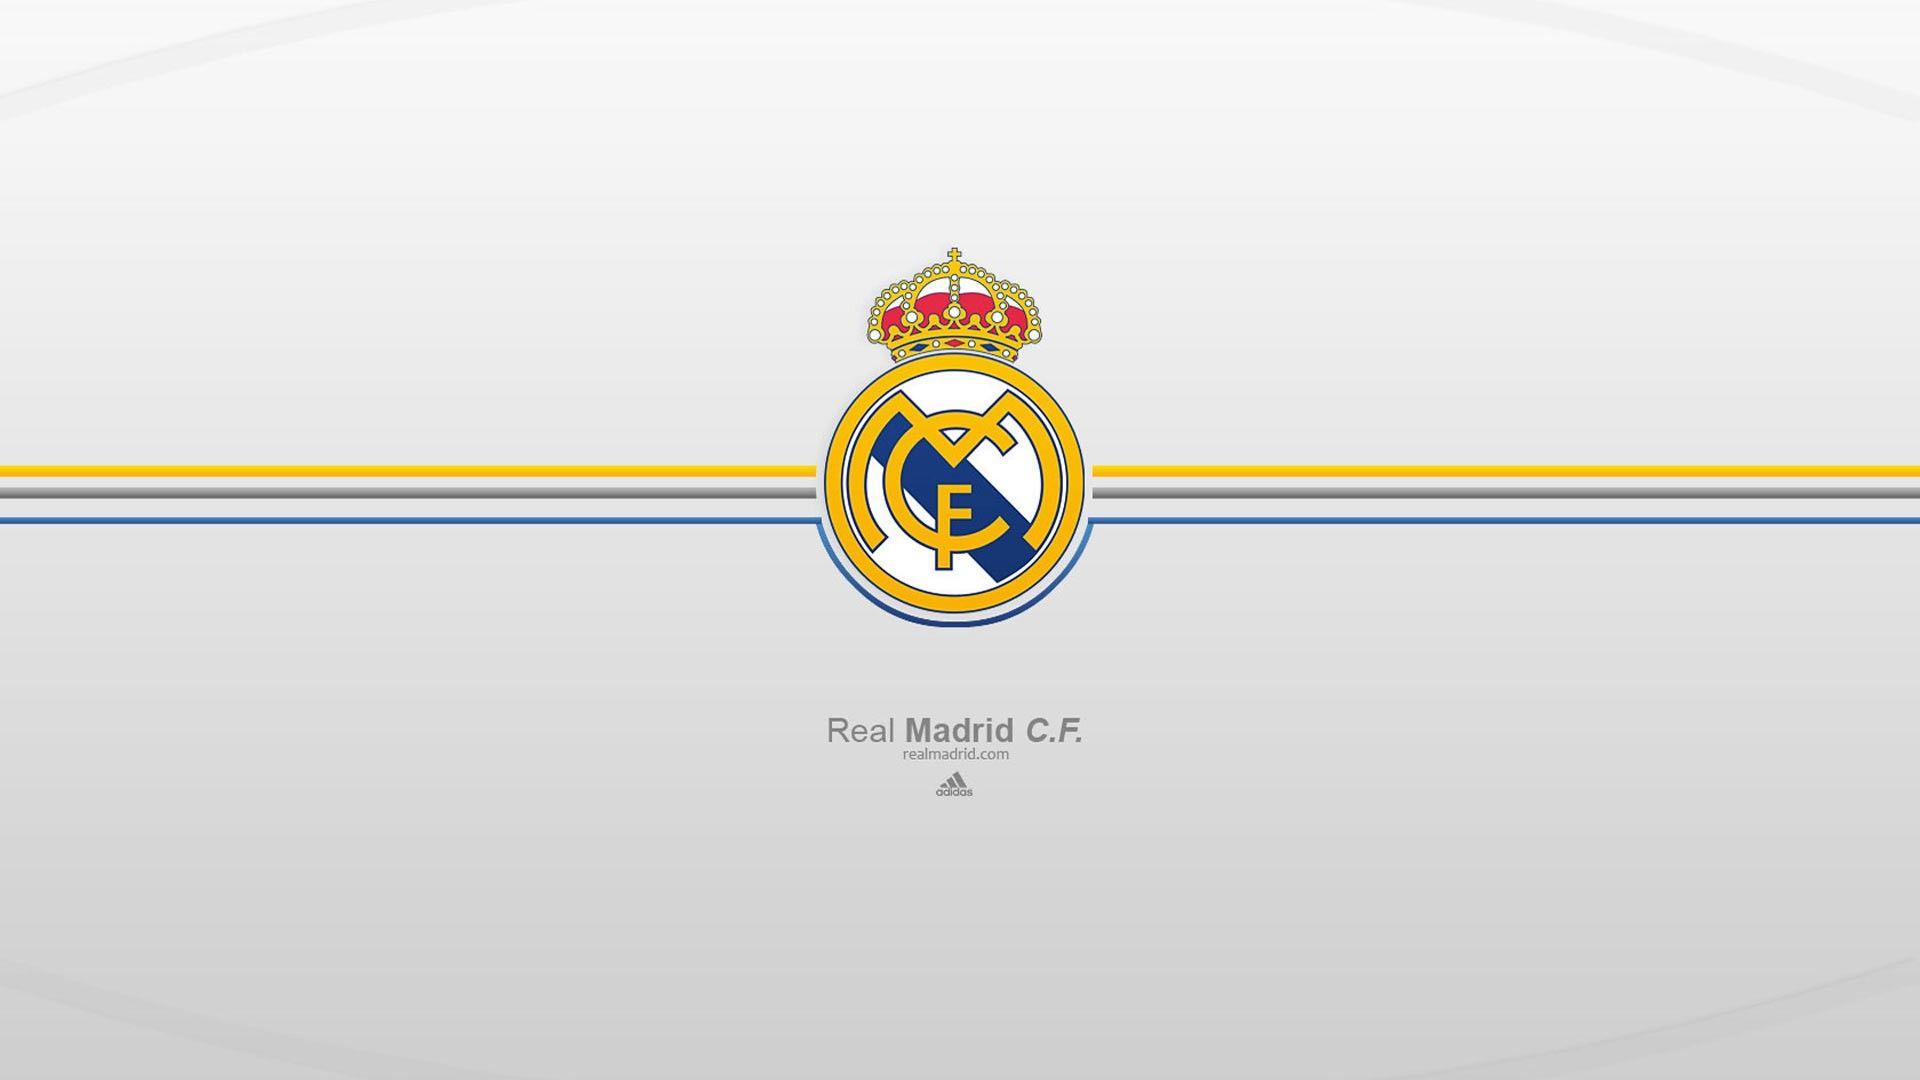 real madrid soccer camp - best wallpaper hd | wallpaper | pinterest